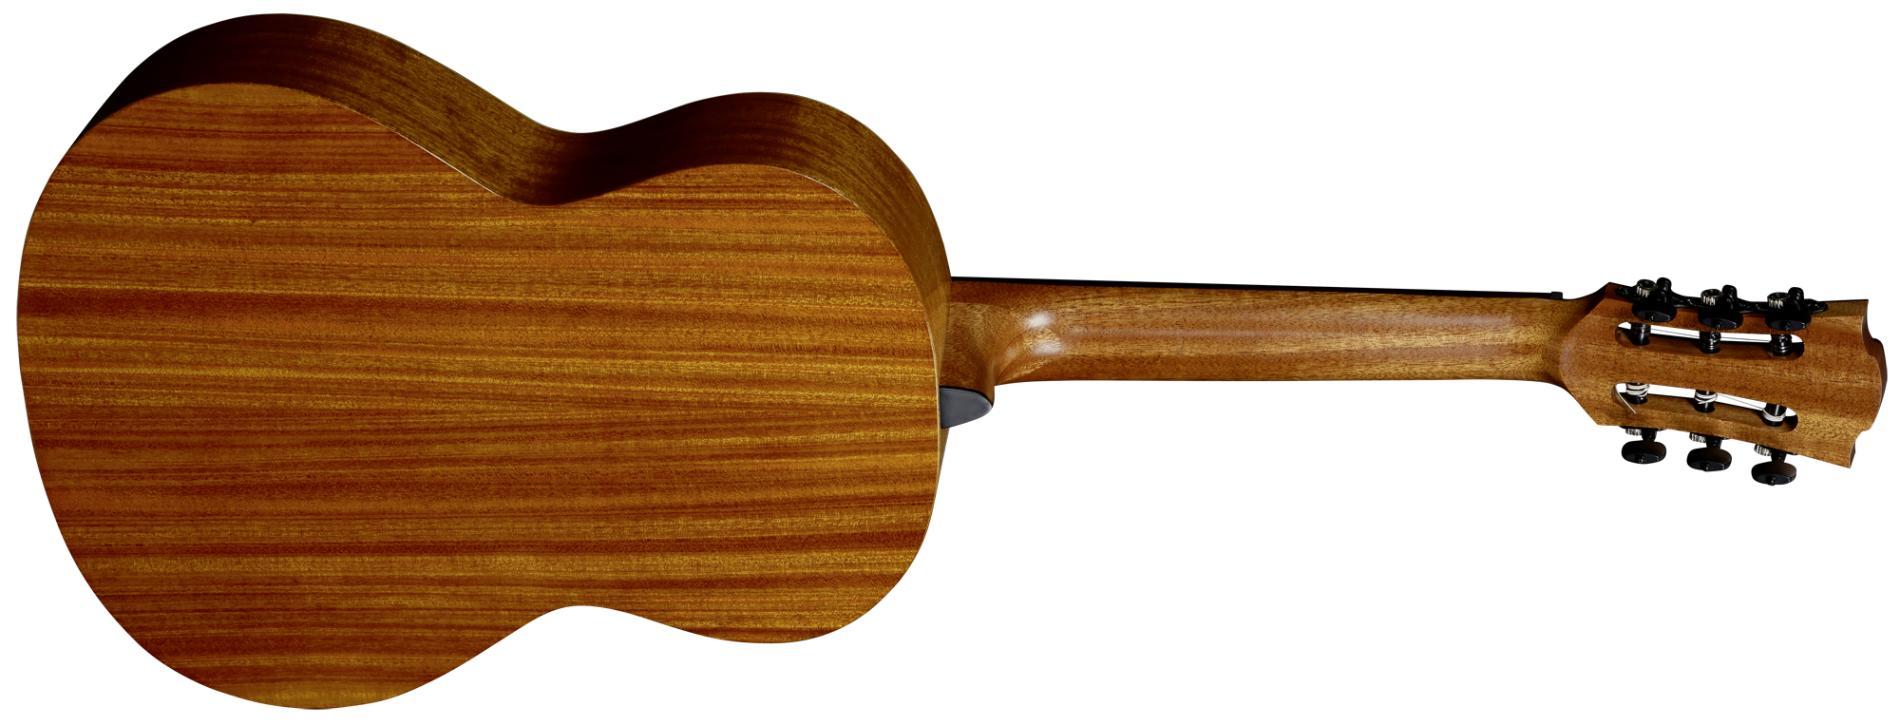 Occitania 88 Konzertgitarre